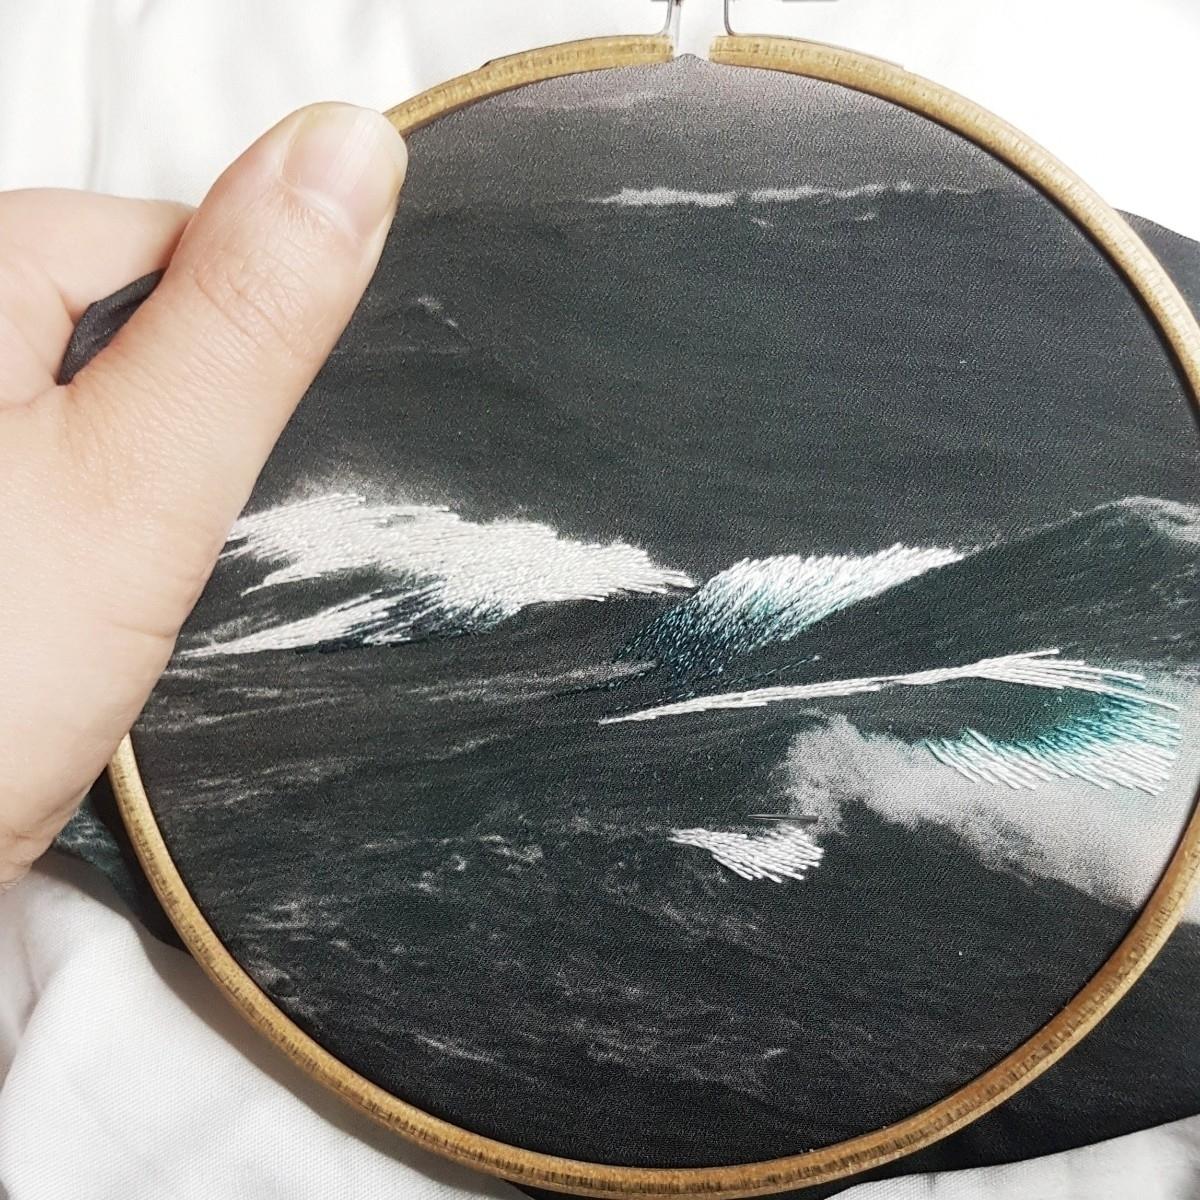 Stormy sea - fullmetalneedle   ello